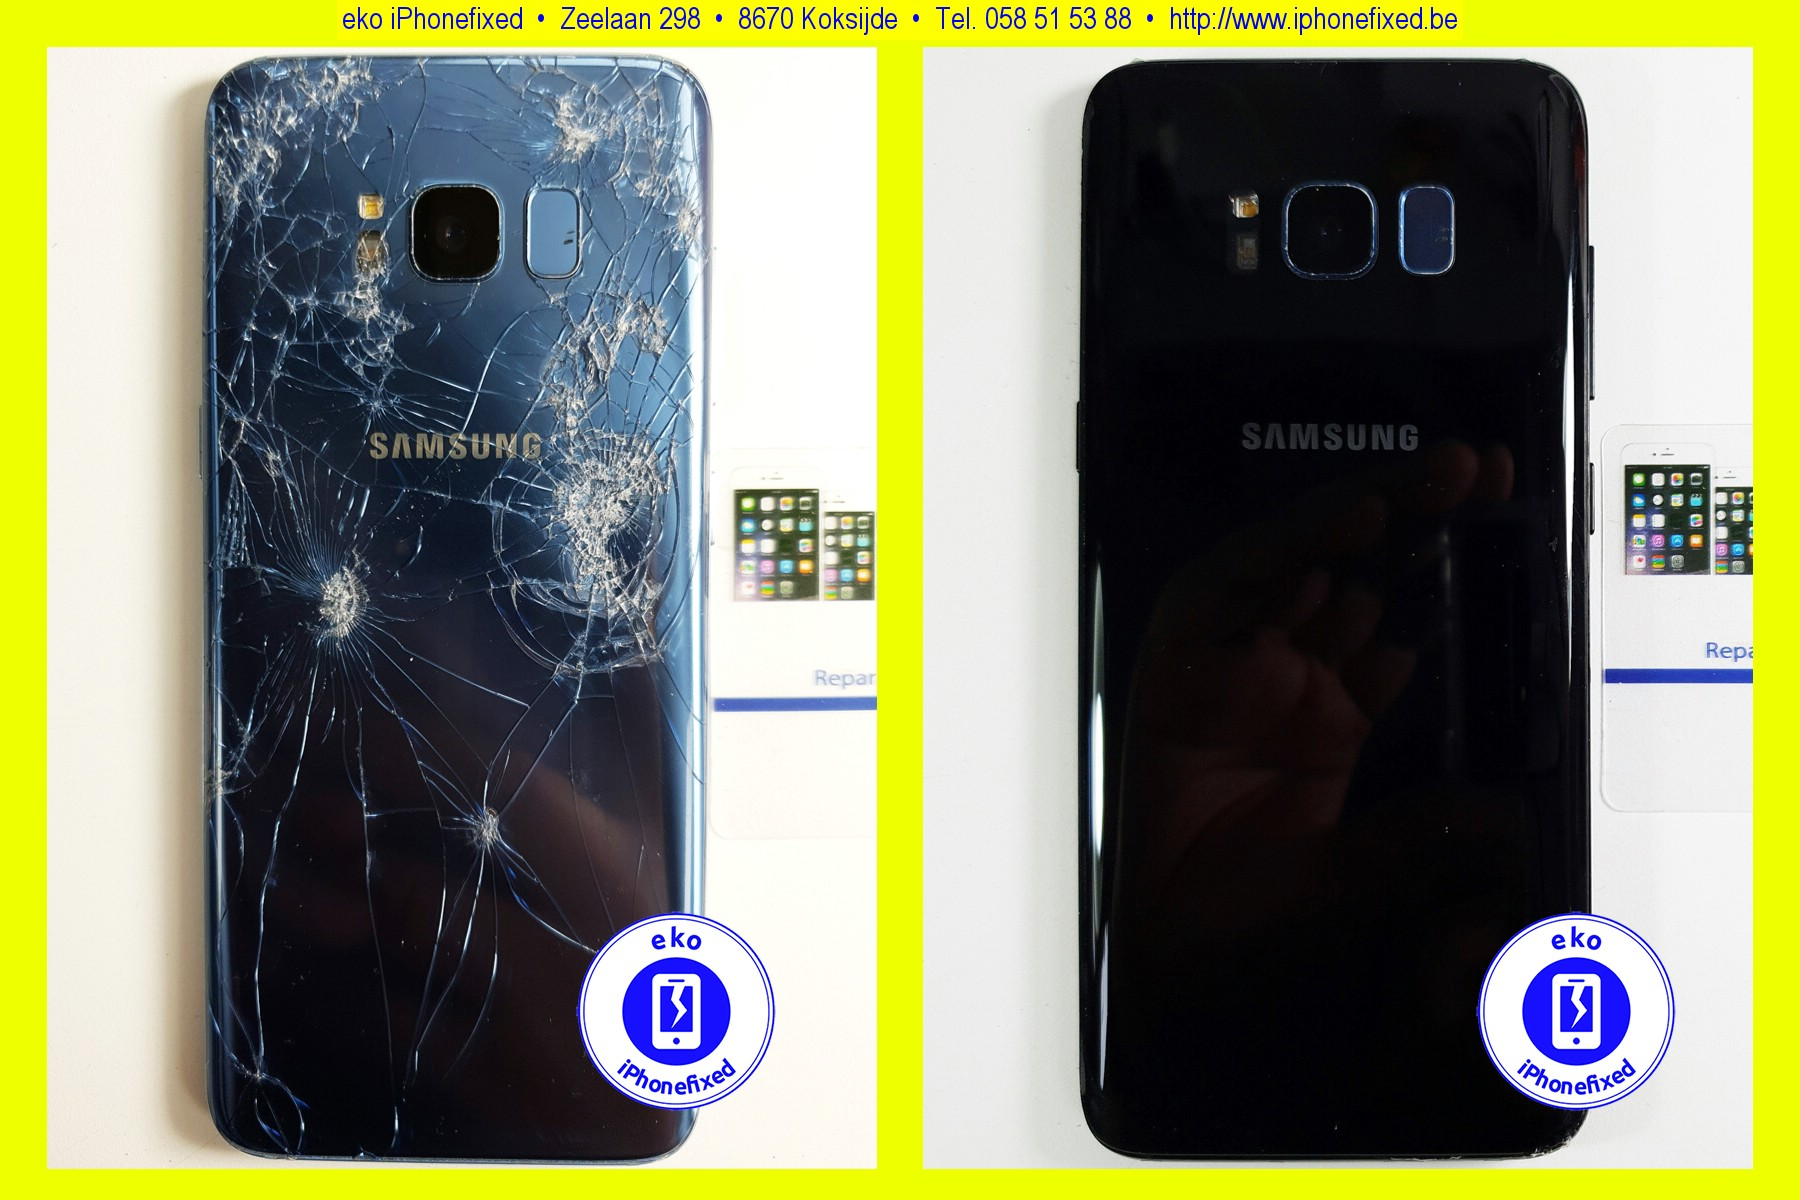 samsung-galaxy-s8-plus-achterkant-glas-vervangen-koksijde-bad-1